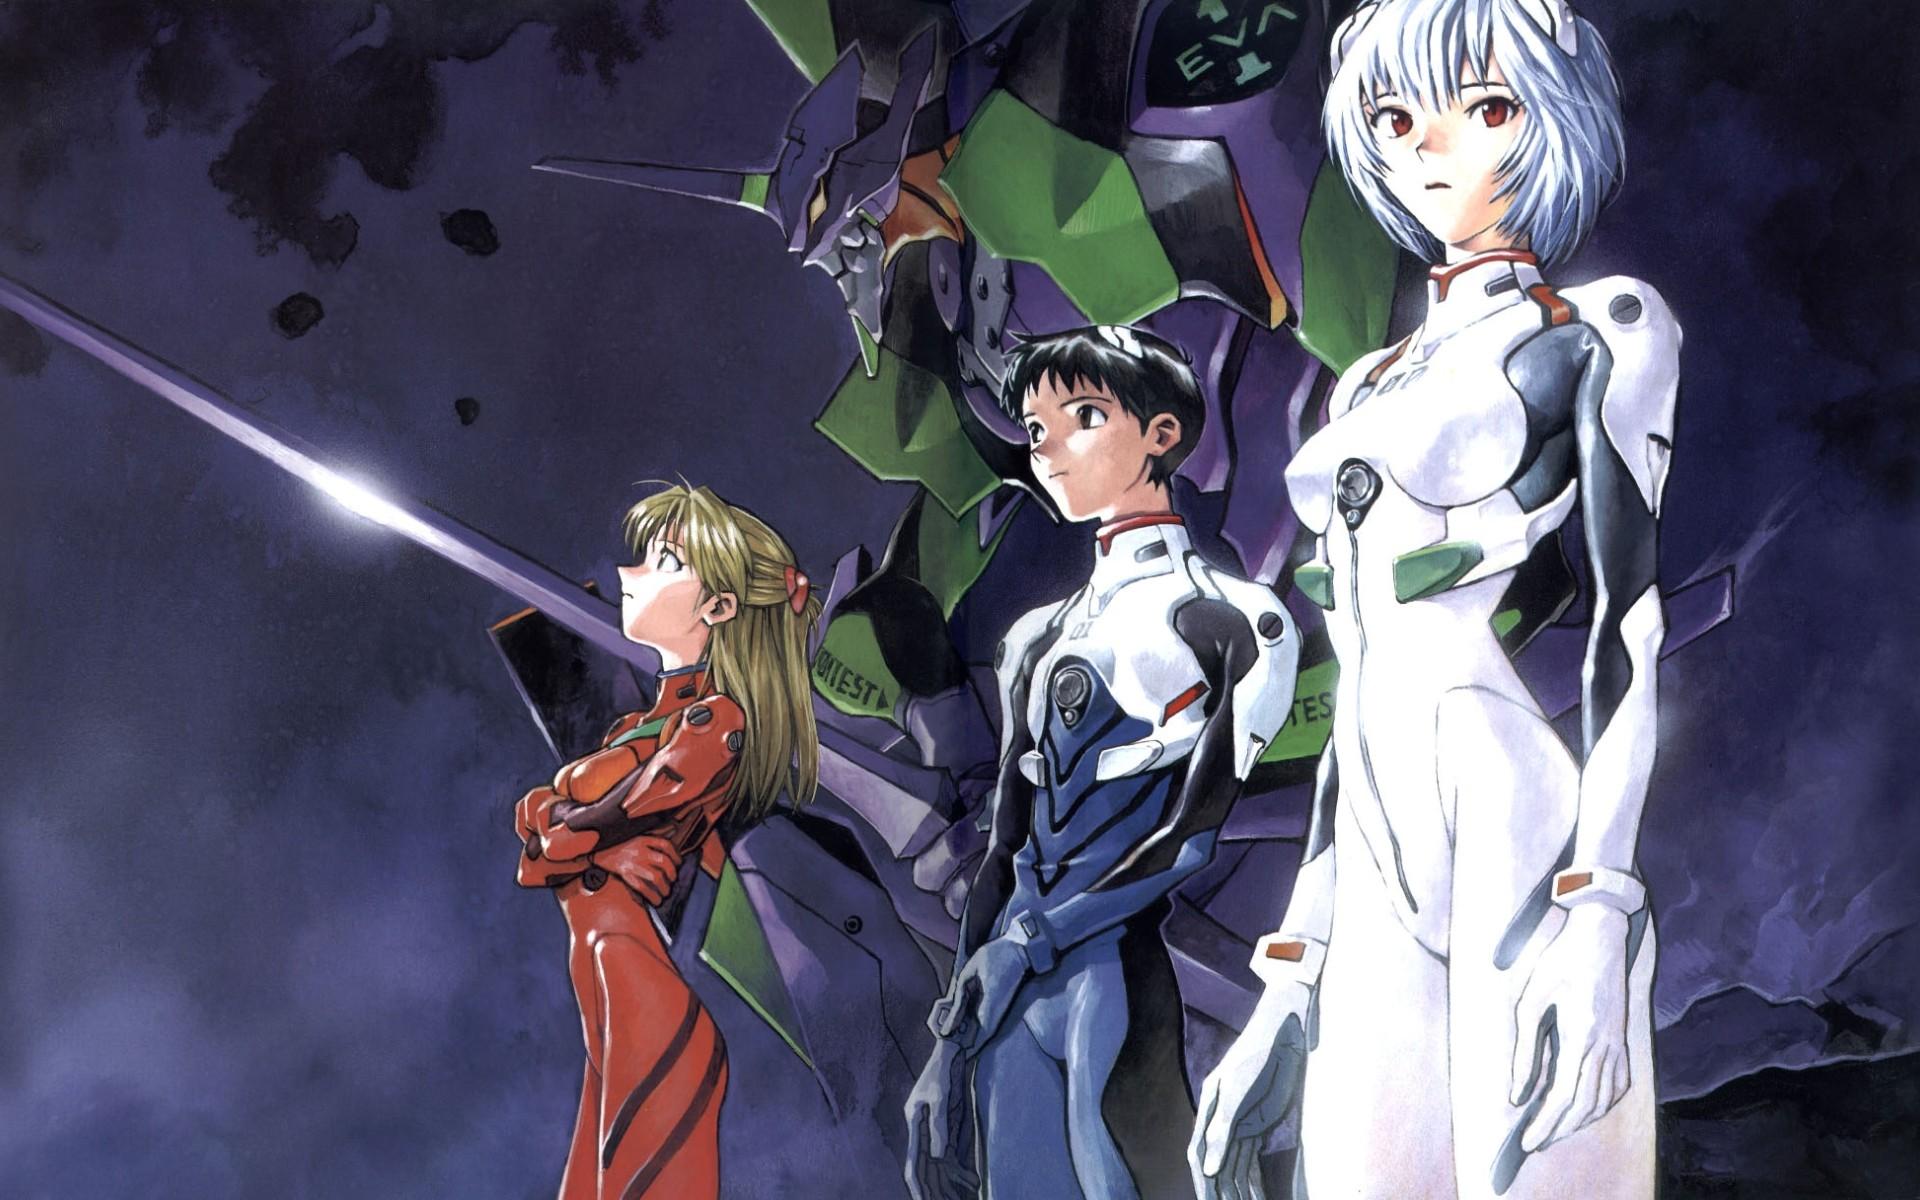 Anime – Neon Genesis Evangelion Asuka Langley Sohryu Shinji Ikari Rei  Ayanami Wallpaper